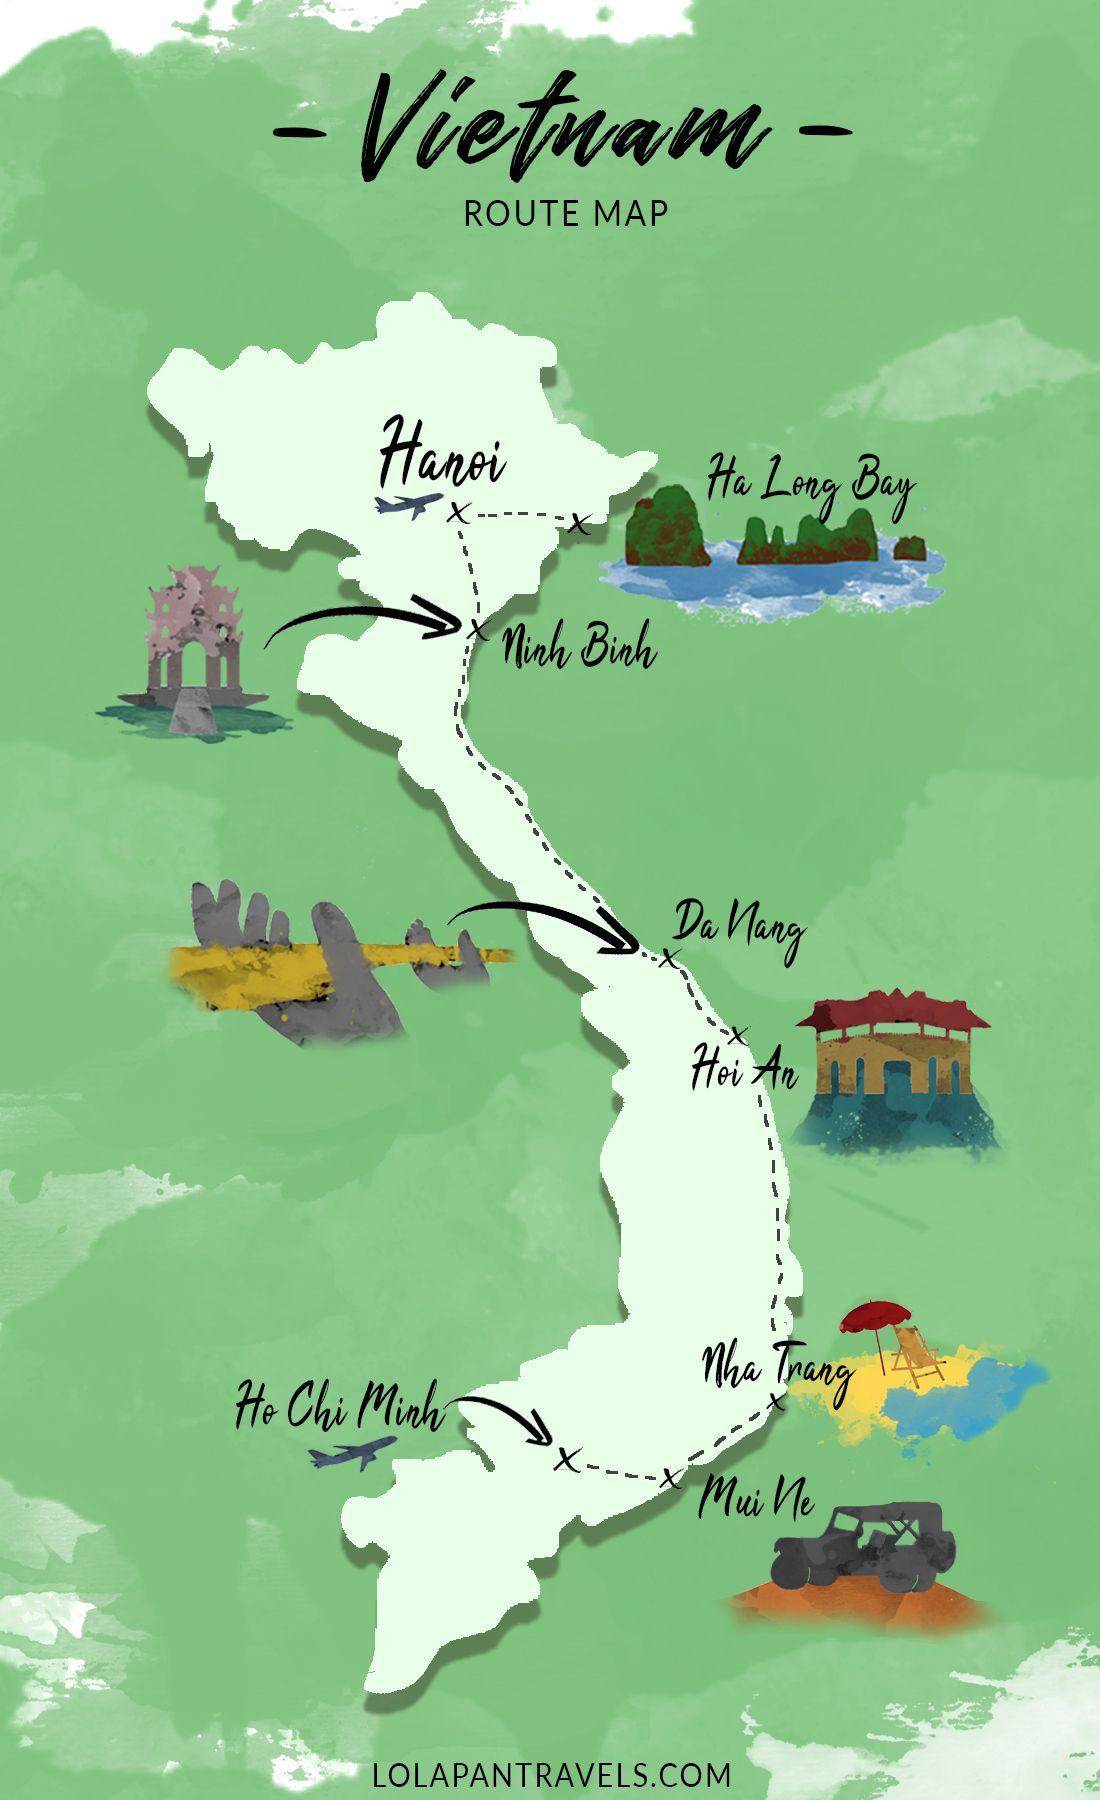 , Vietnam Archives | Lolapan Travels, My Travels Blog 2020, My Travels Blog 2020